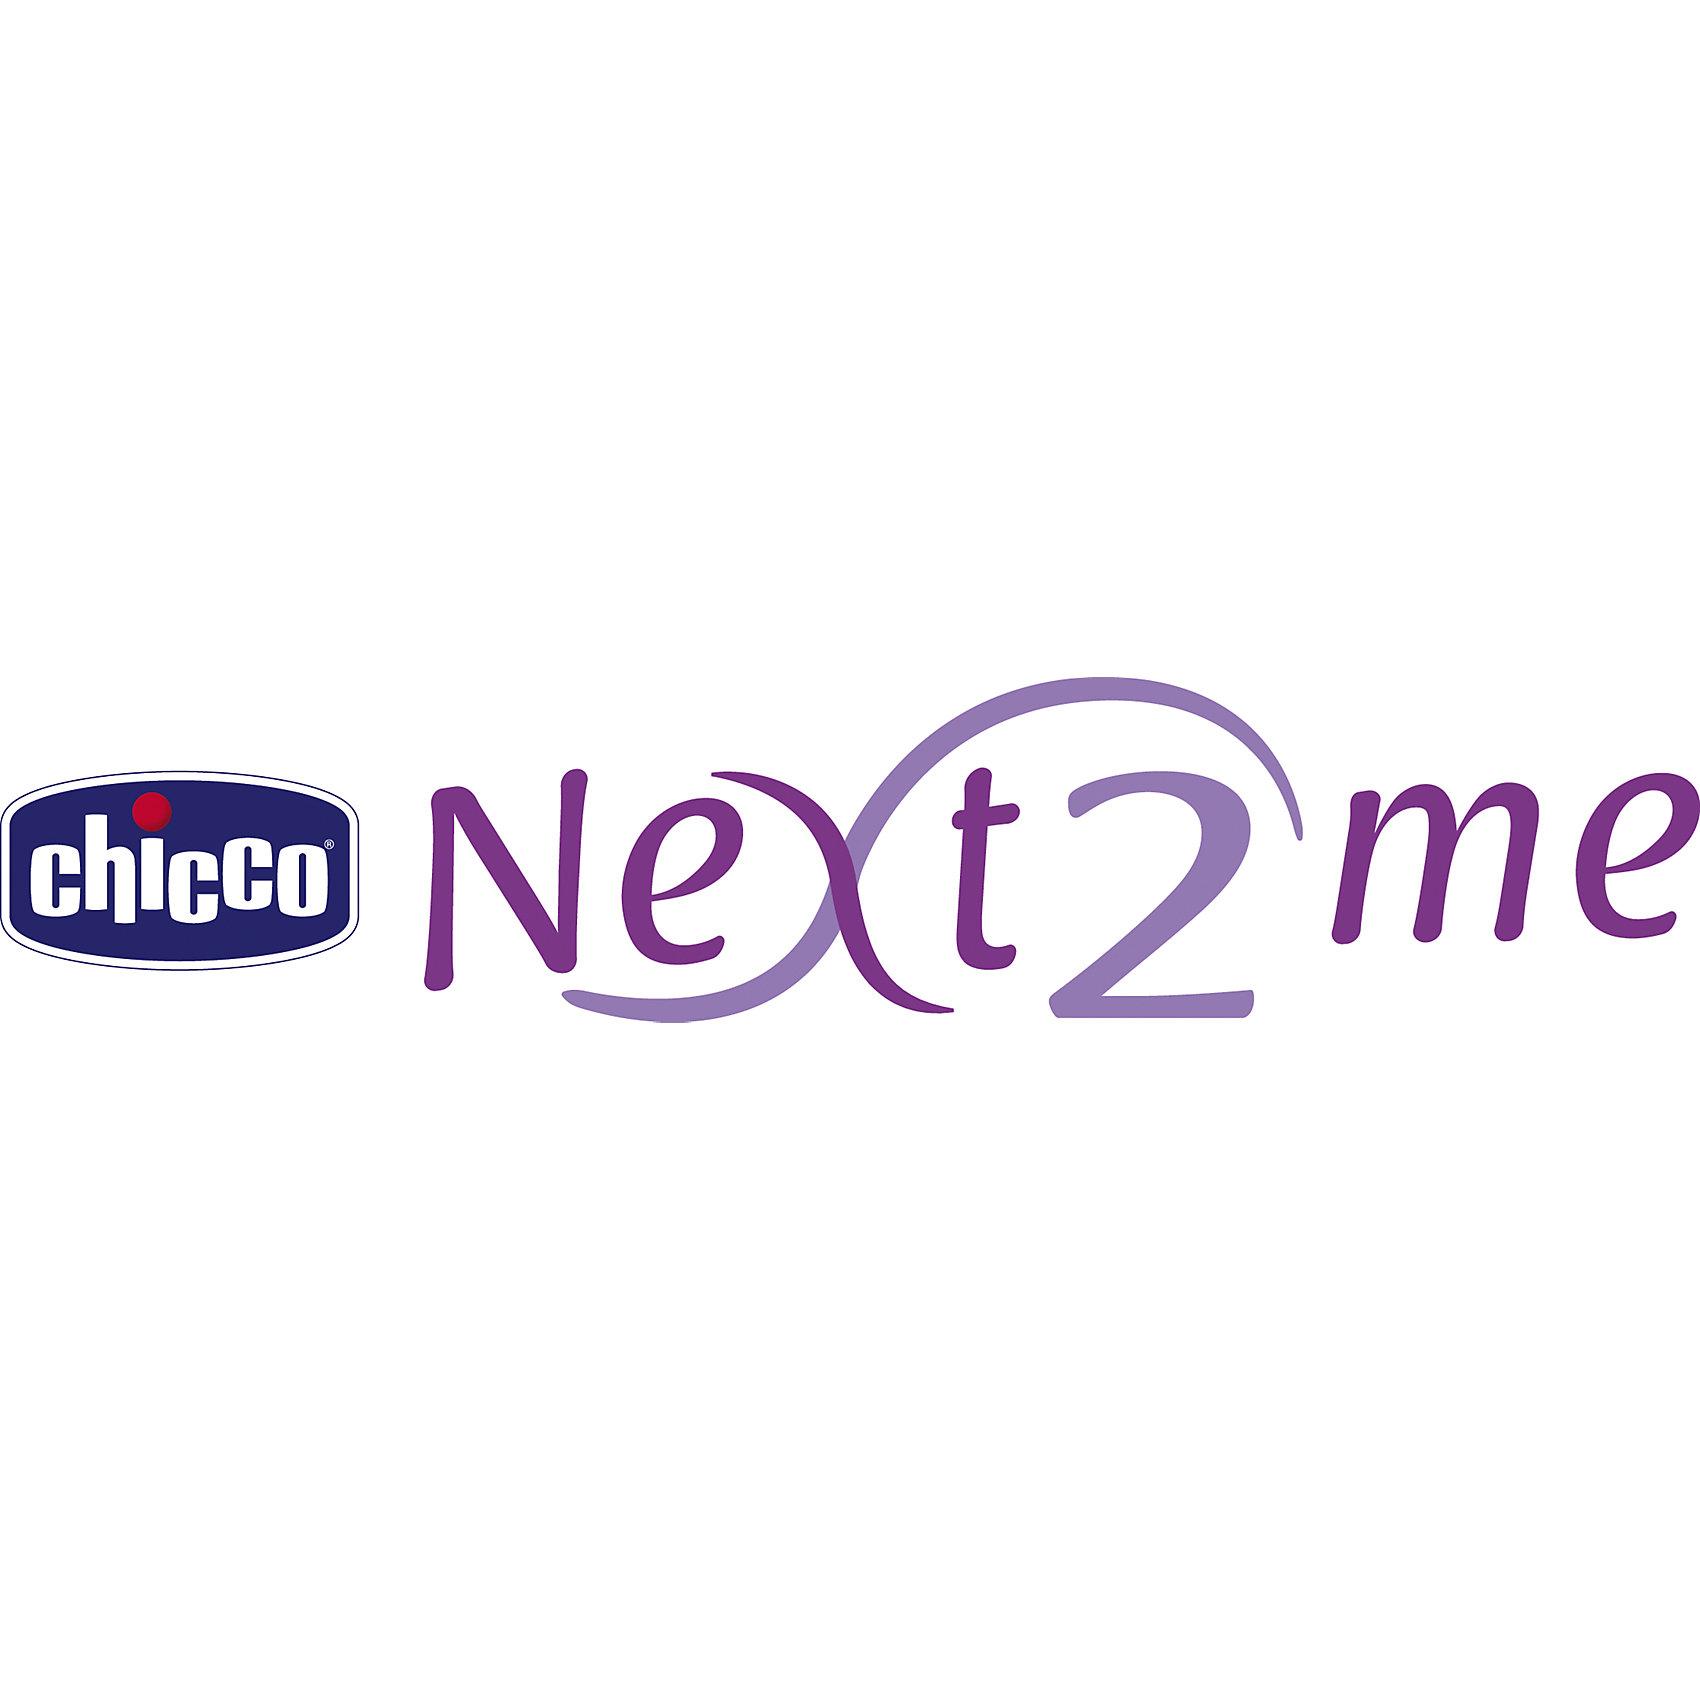 Функциональная кроватка Next2me Denim, Chicco (CHICCO)